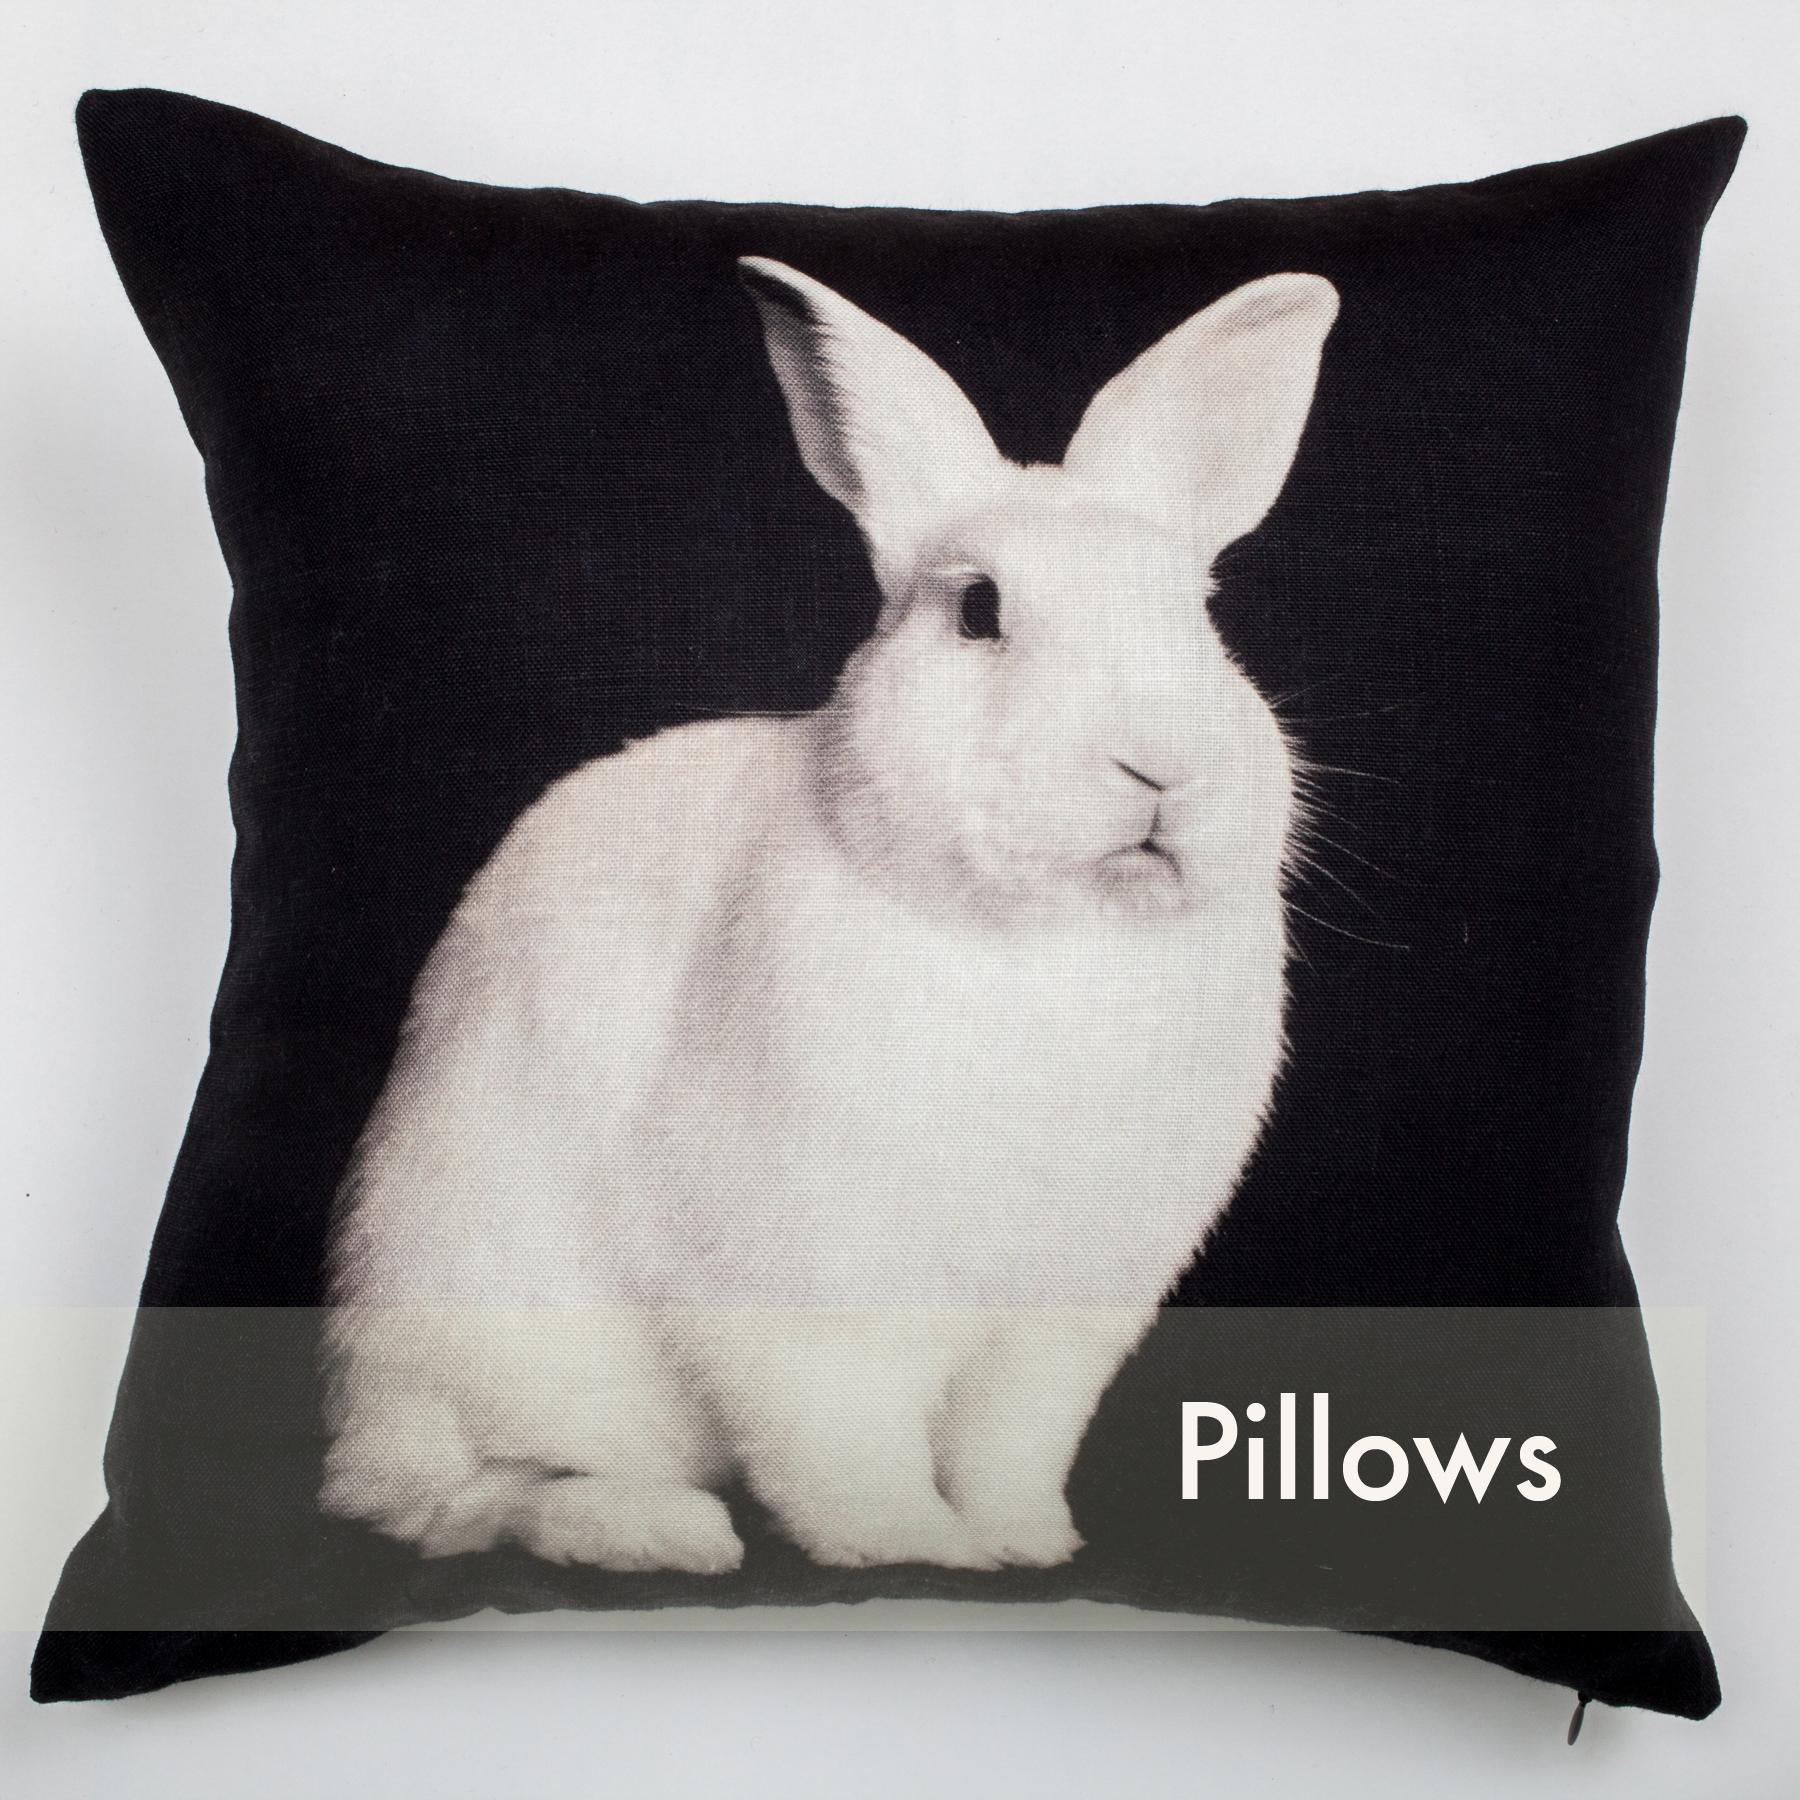 IMG_9644 pillows.jpg